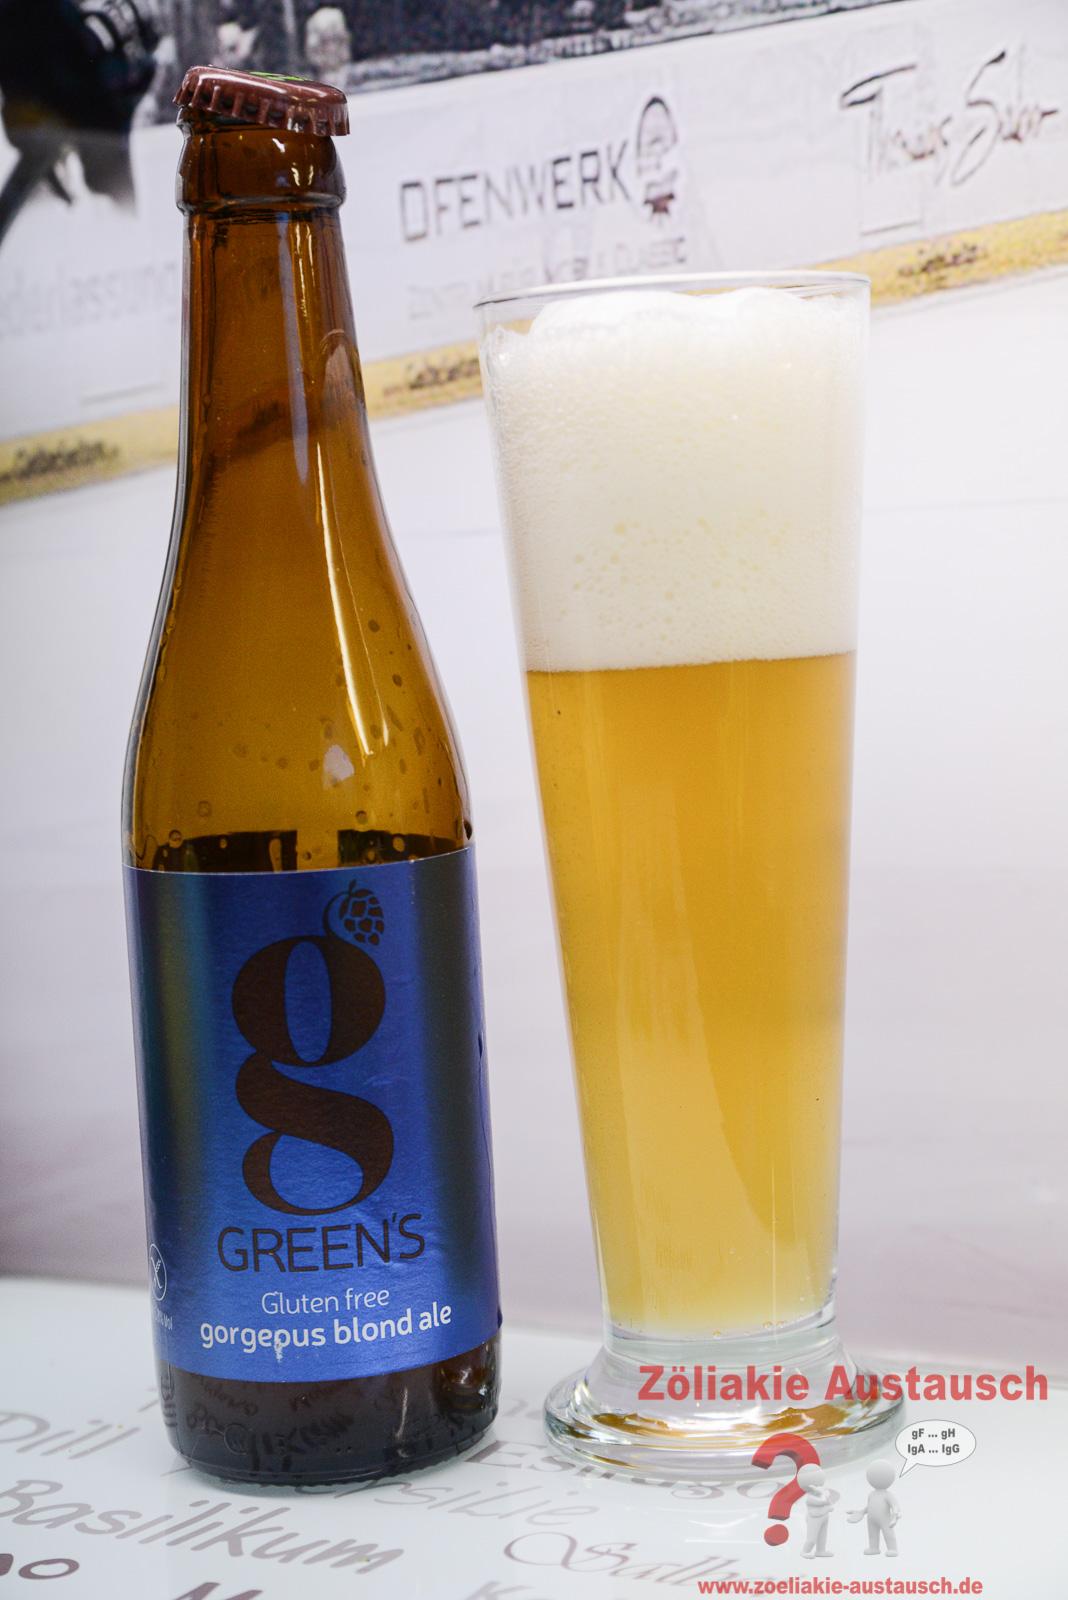 Greens_Glutenfrei_Bier_003